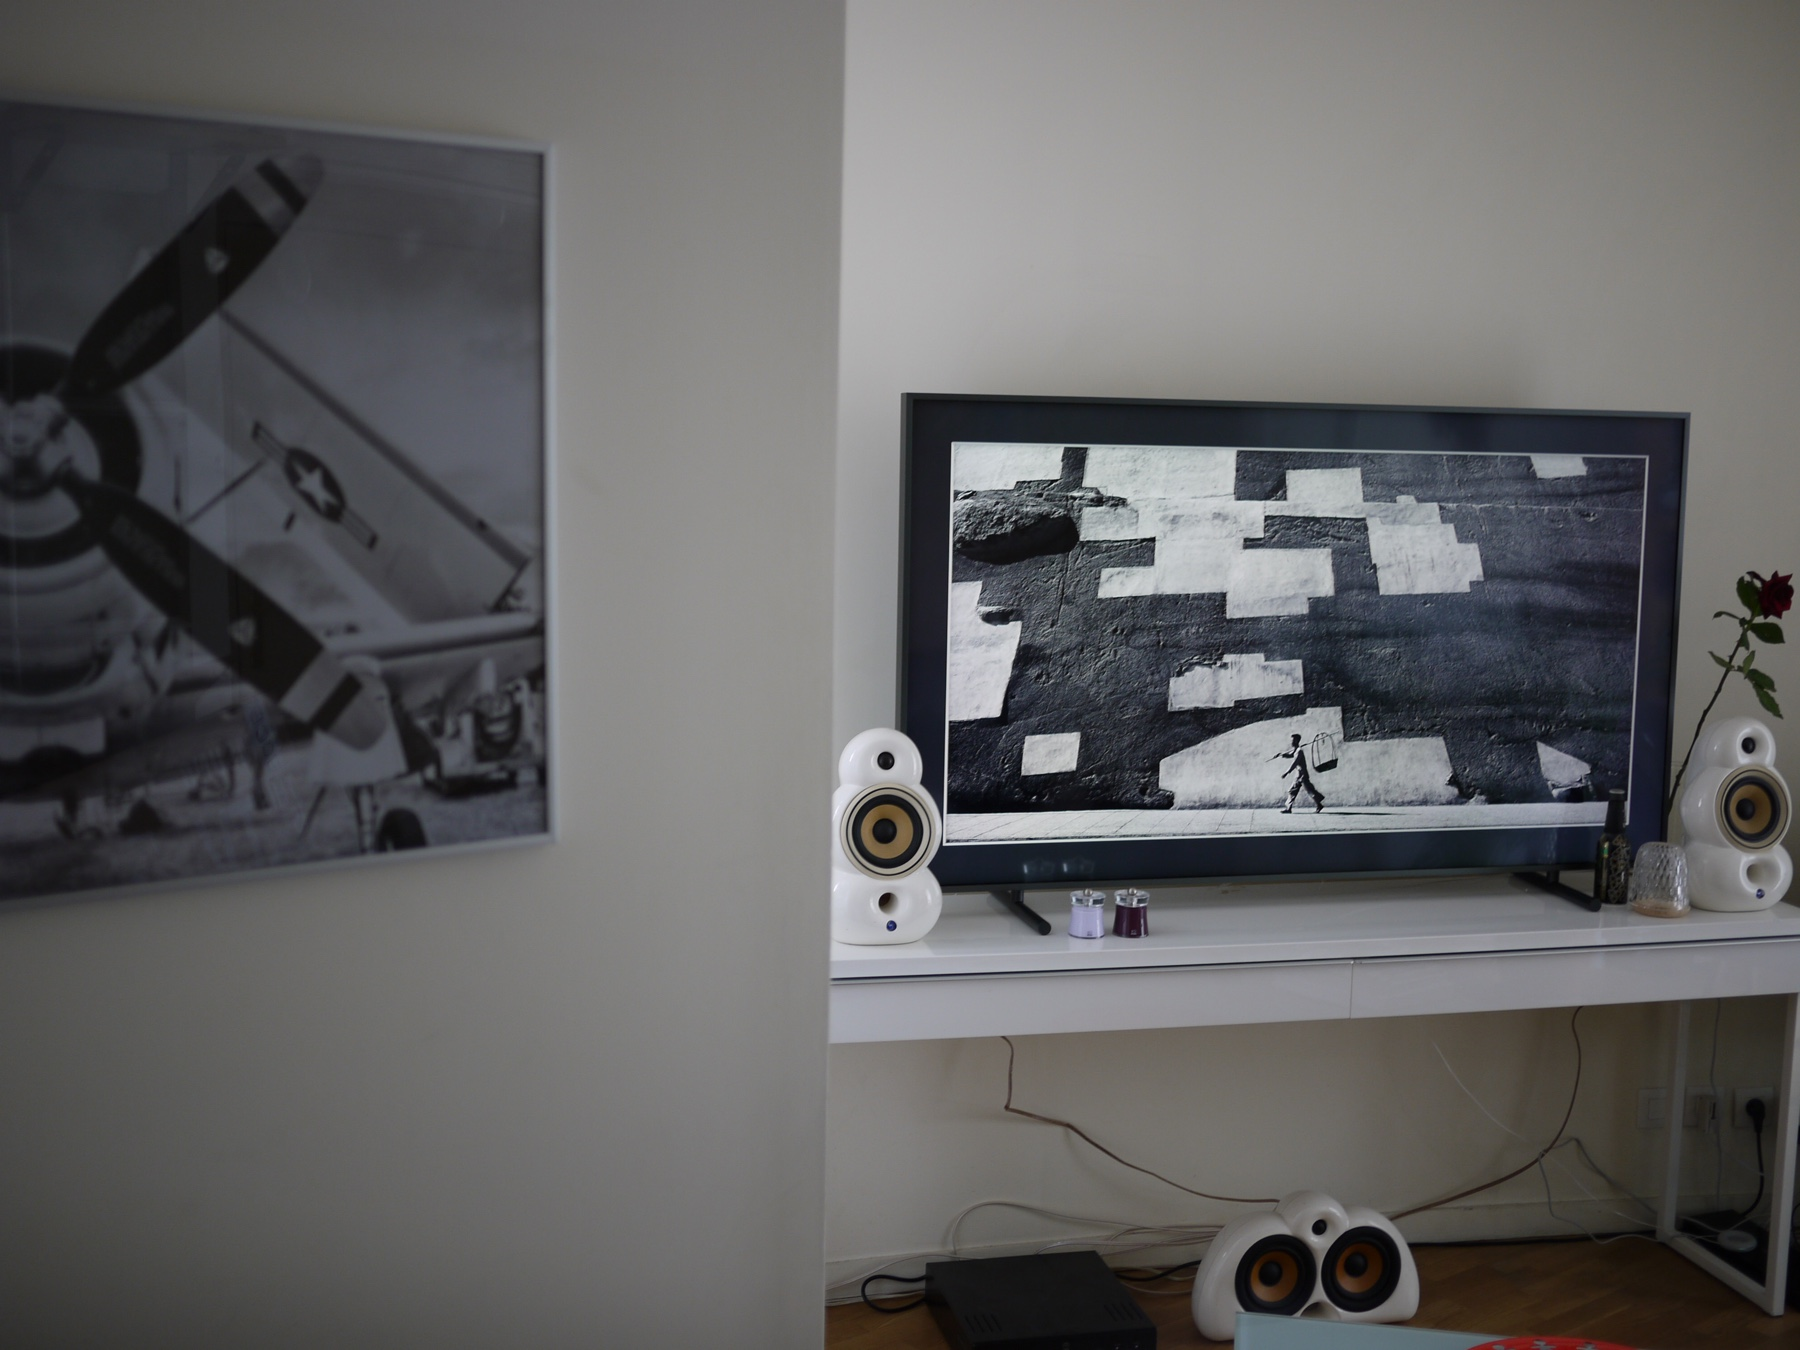 Comment Cacher Fils Tv Murale test] samsung the frame vs qled : technologie et design